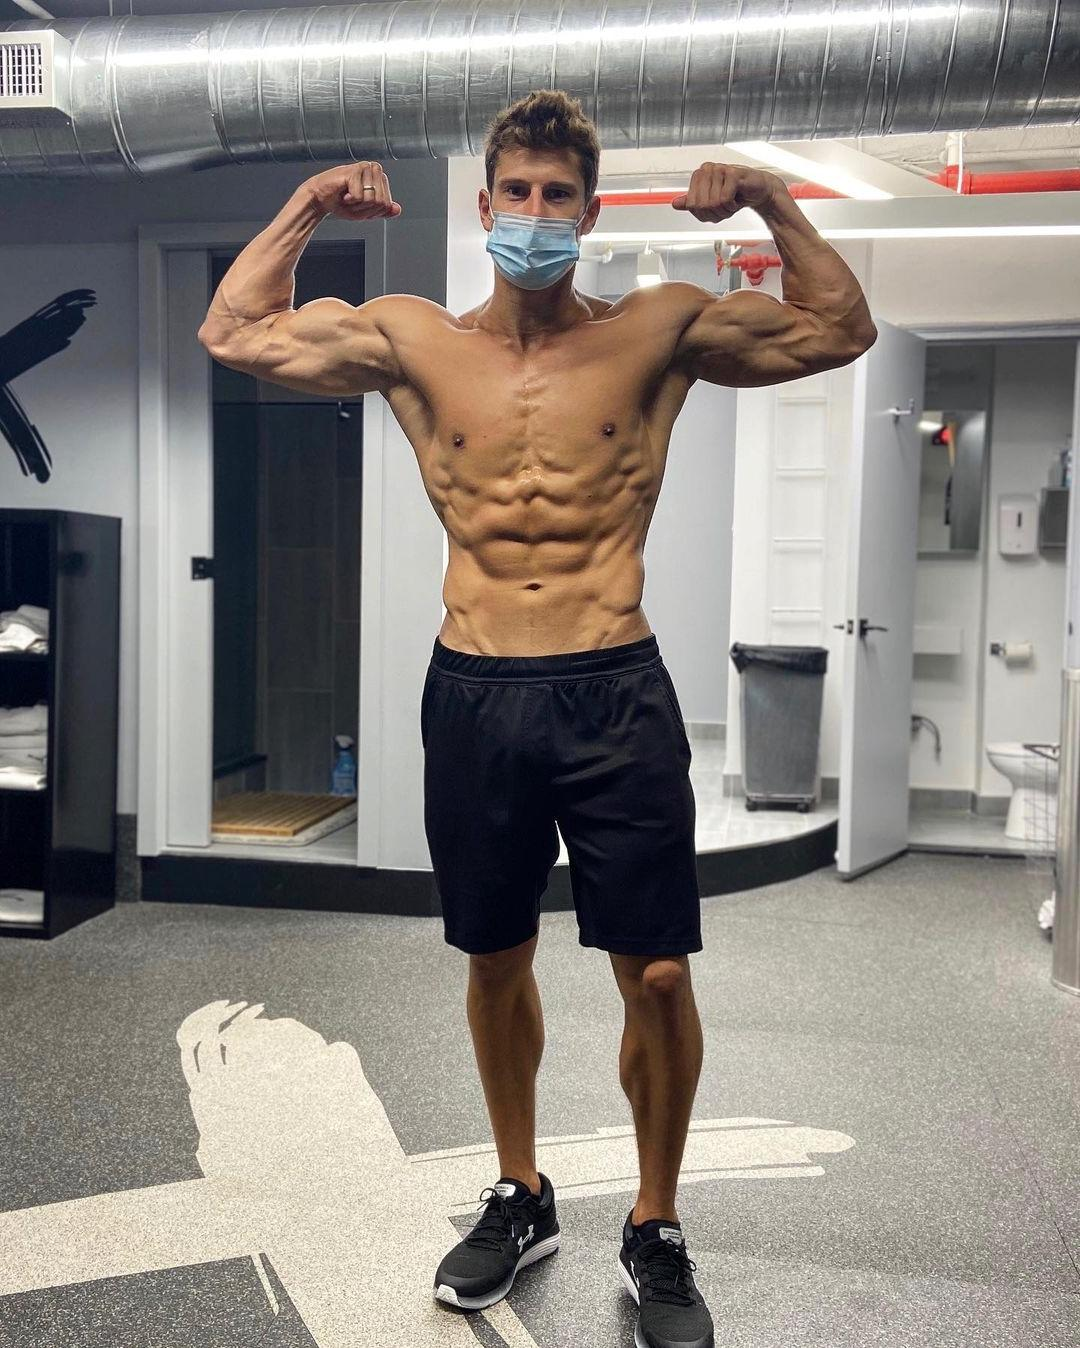 shirtless-muscle-guy-face-mask-biceps-flex